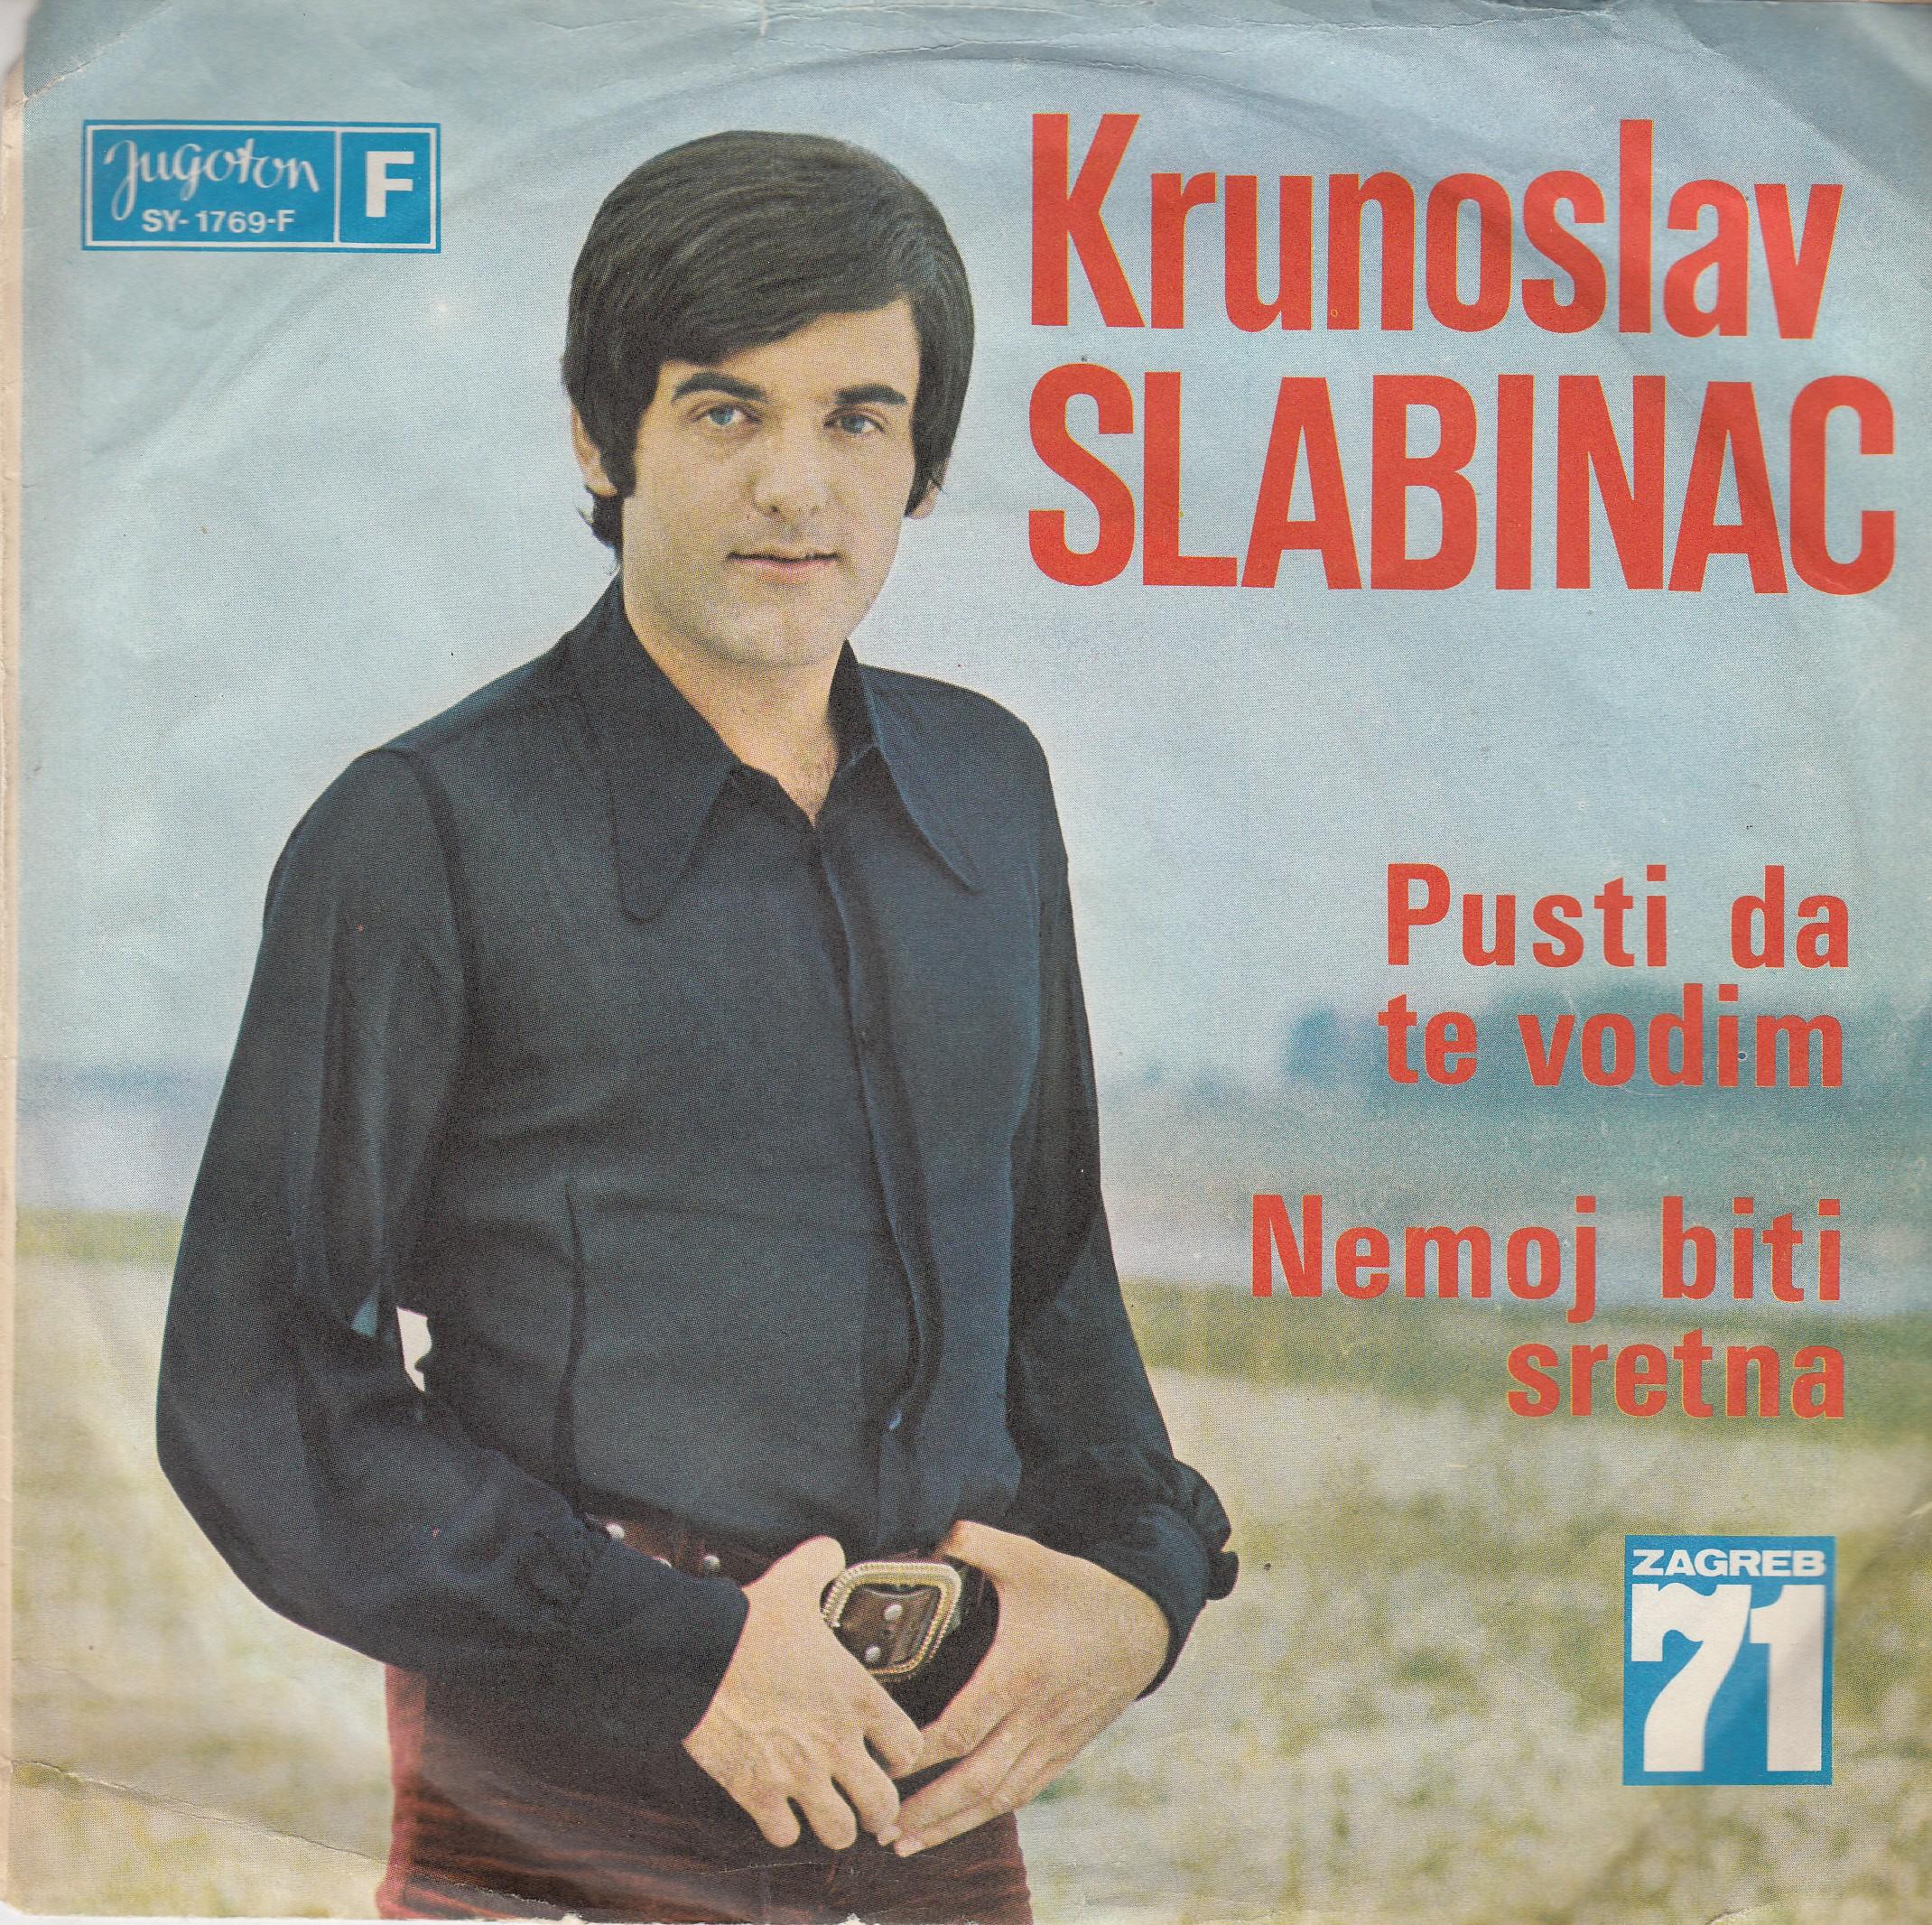 Slabinac Krunoslav - Pusti Da Te Vodim/nemoj Biti Sretna